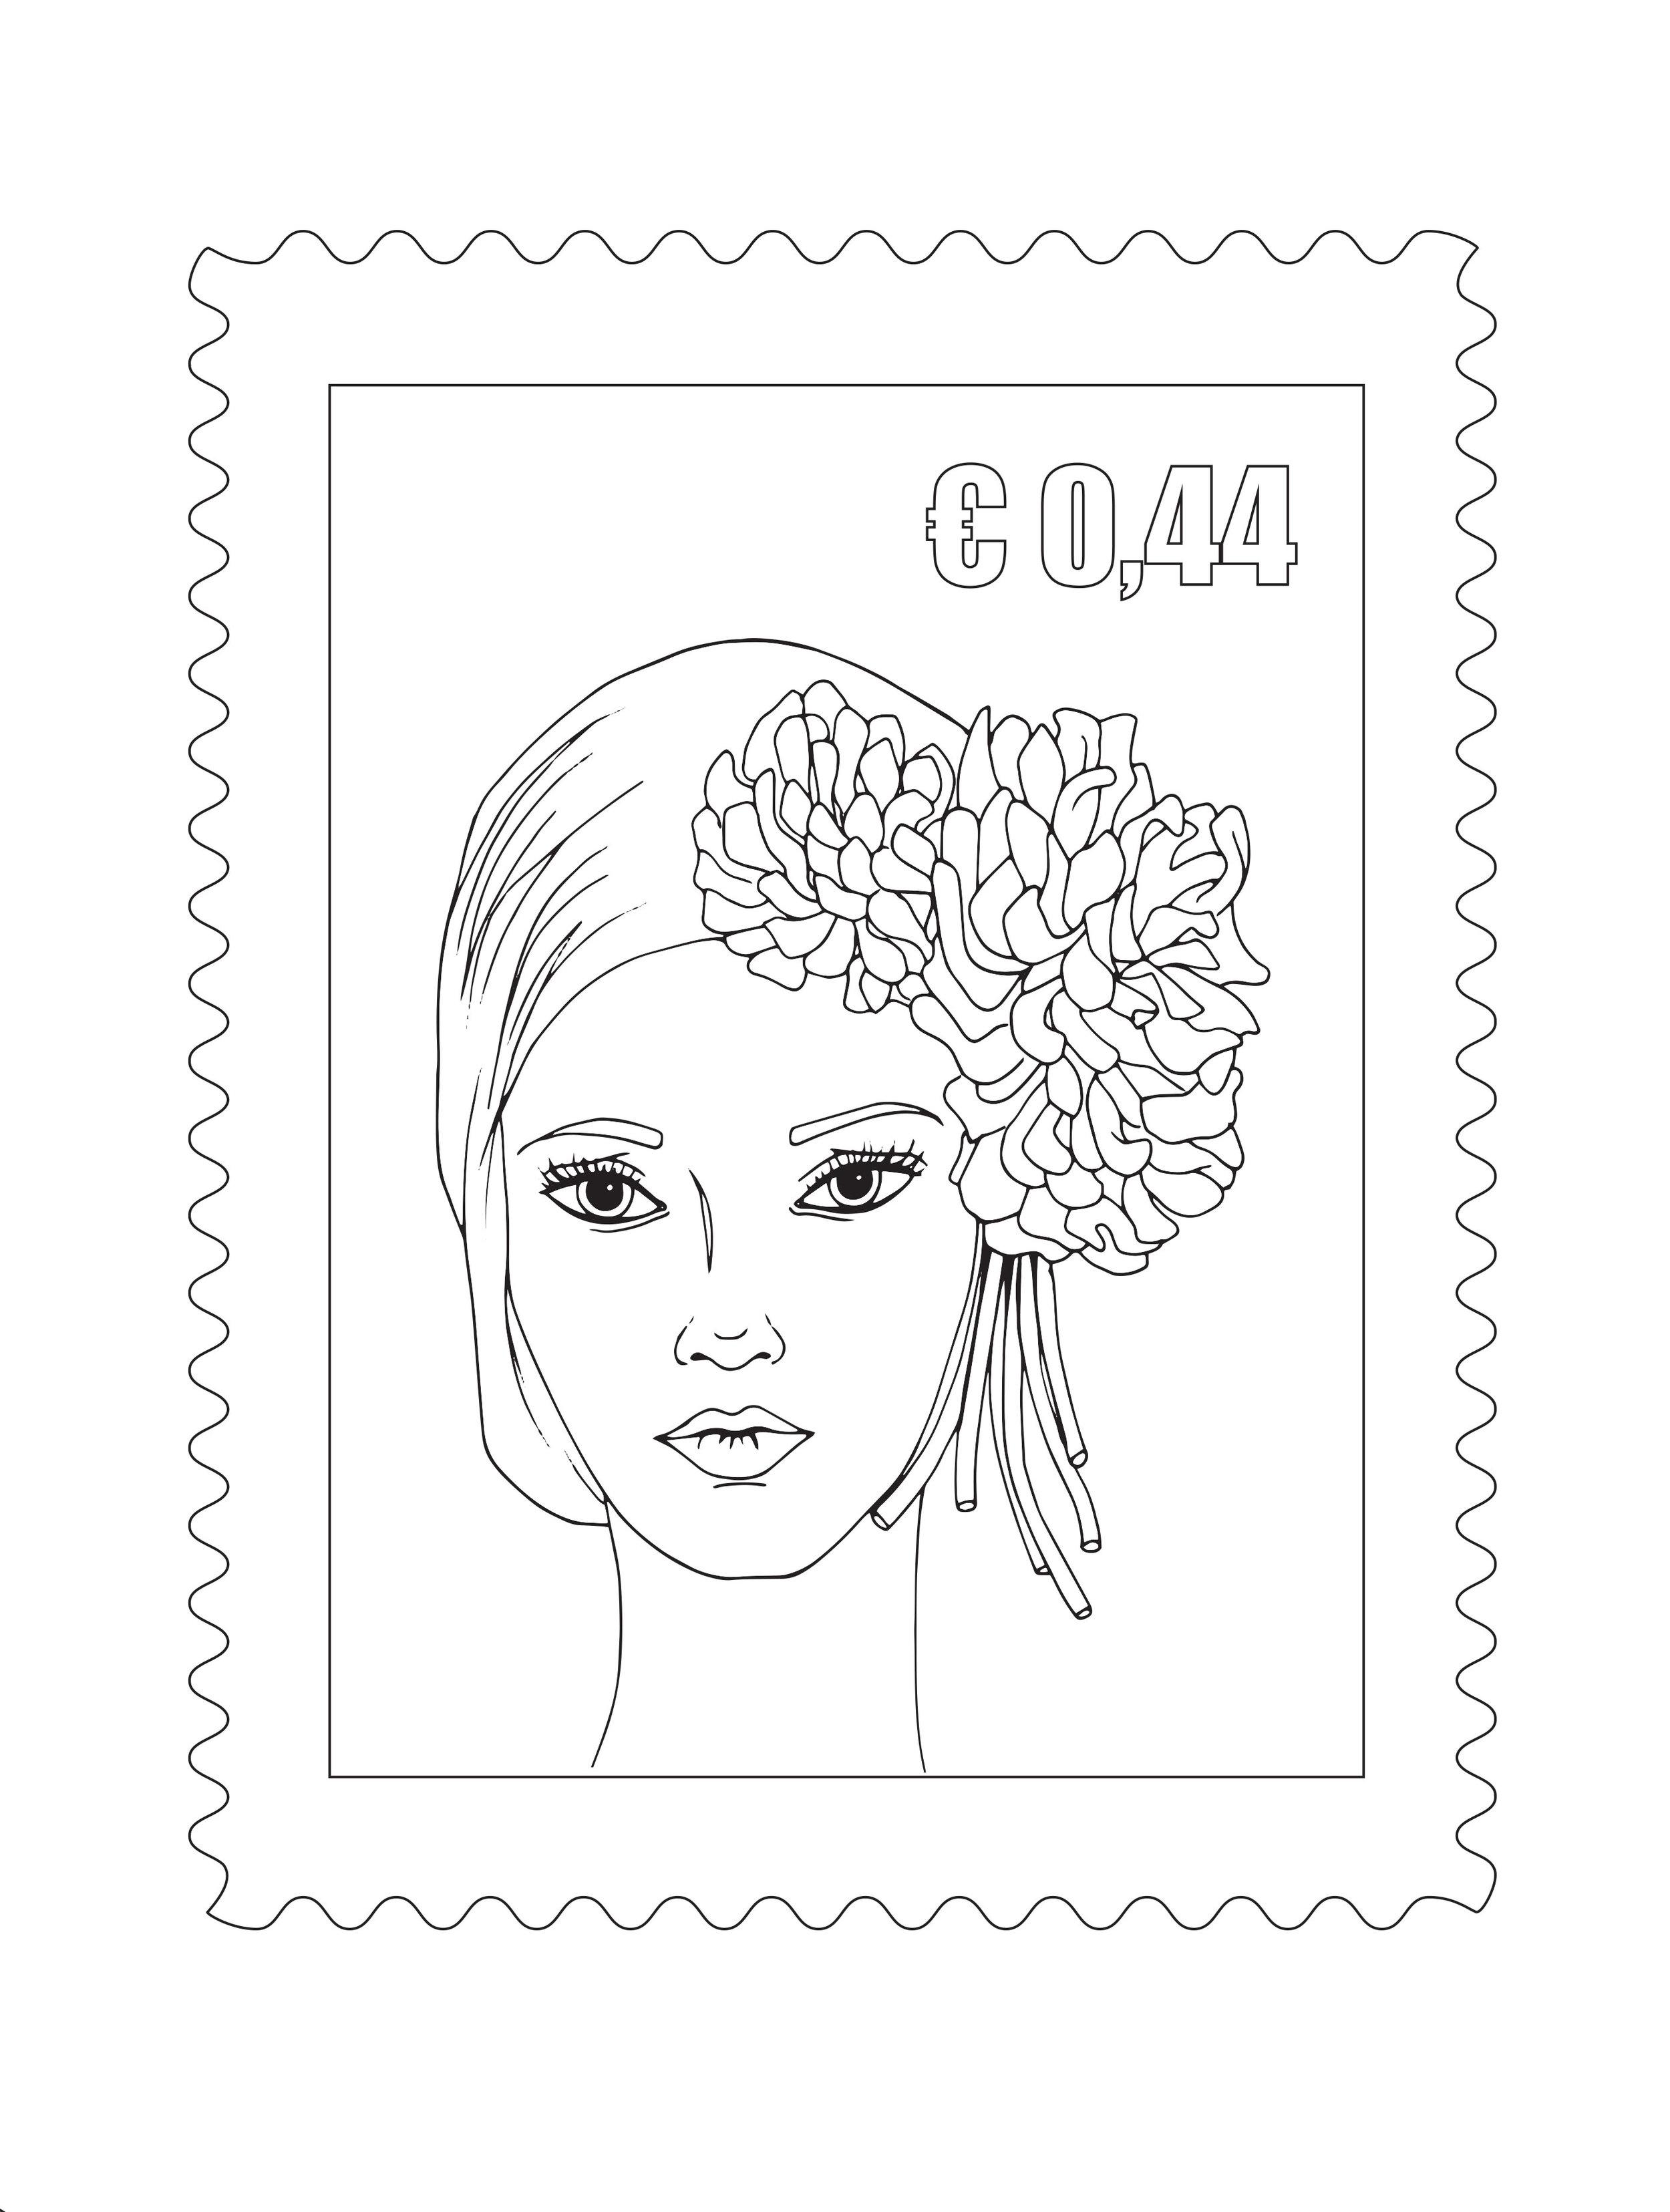 stamp.jpg